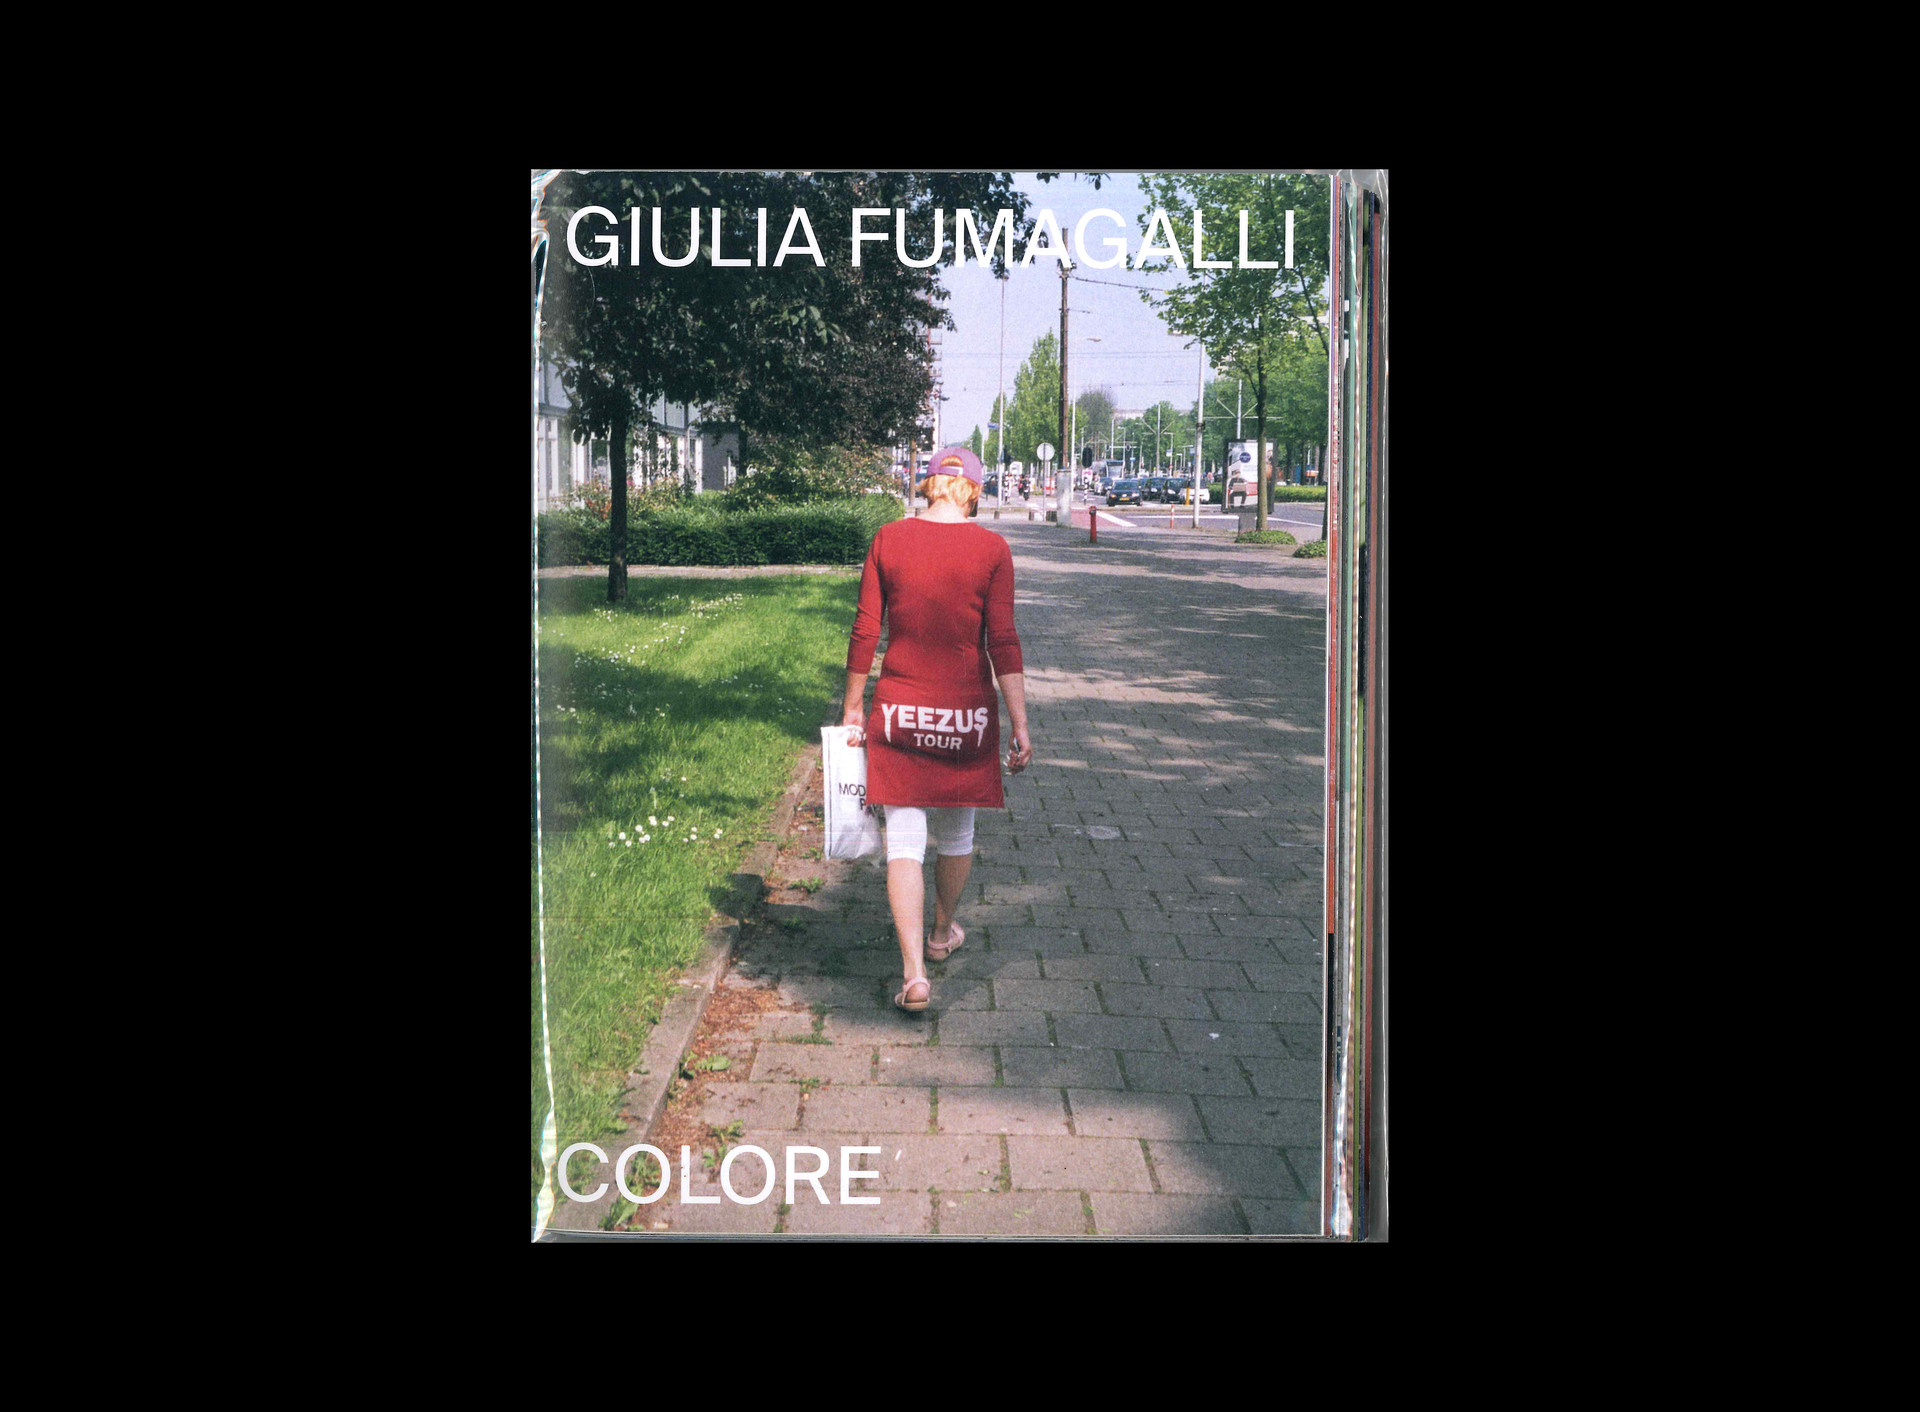 giulia_fumagalli_colore_00.jpg